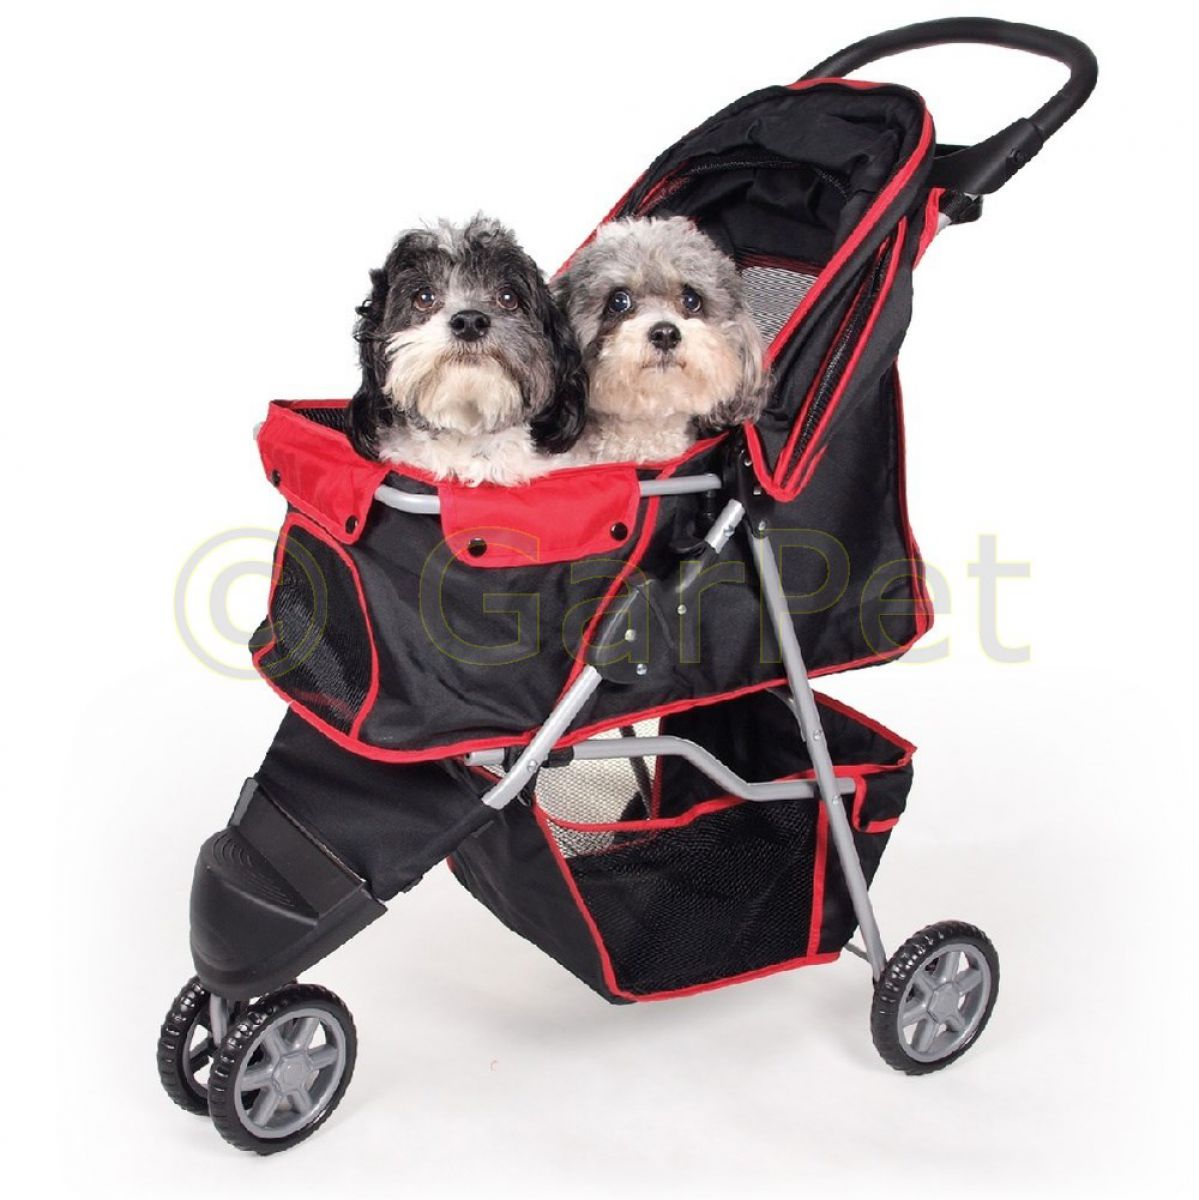 hunde katzen haustier wagen buggy stroller sonnendach. Black Bedroom Furniture Sets. Home Design Ideas